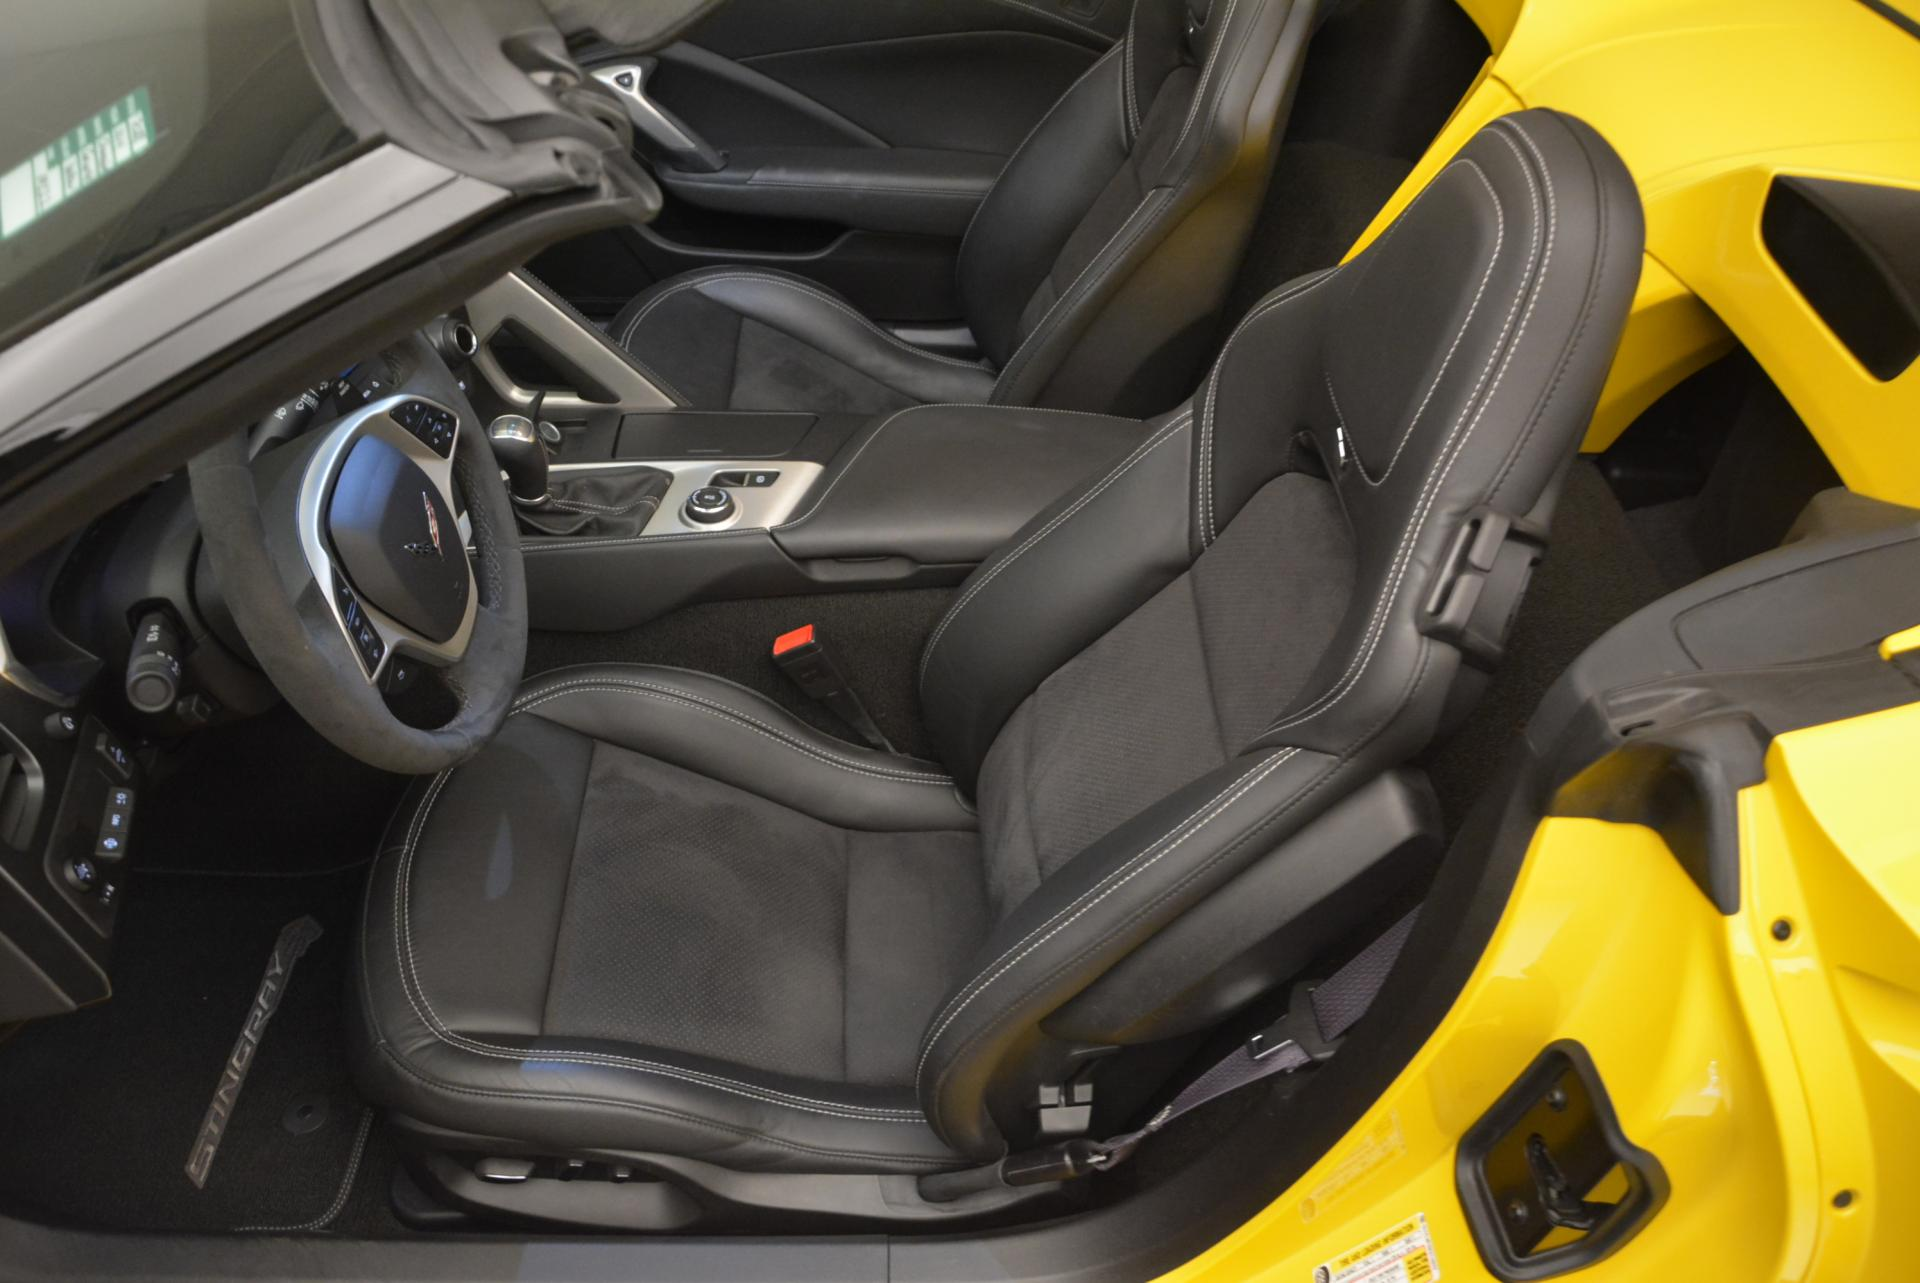 Used 2014 Chevrolet Corvette Stingray Z51 For Sale In Greenwich, CT 523_p14